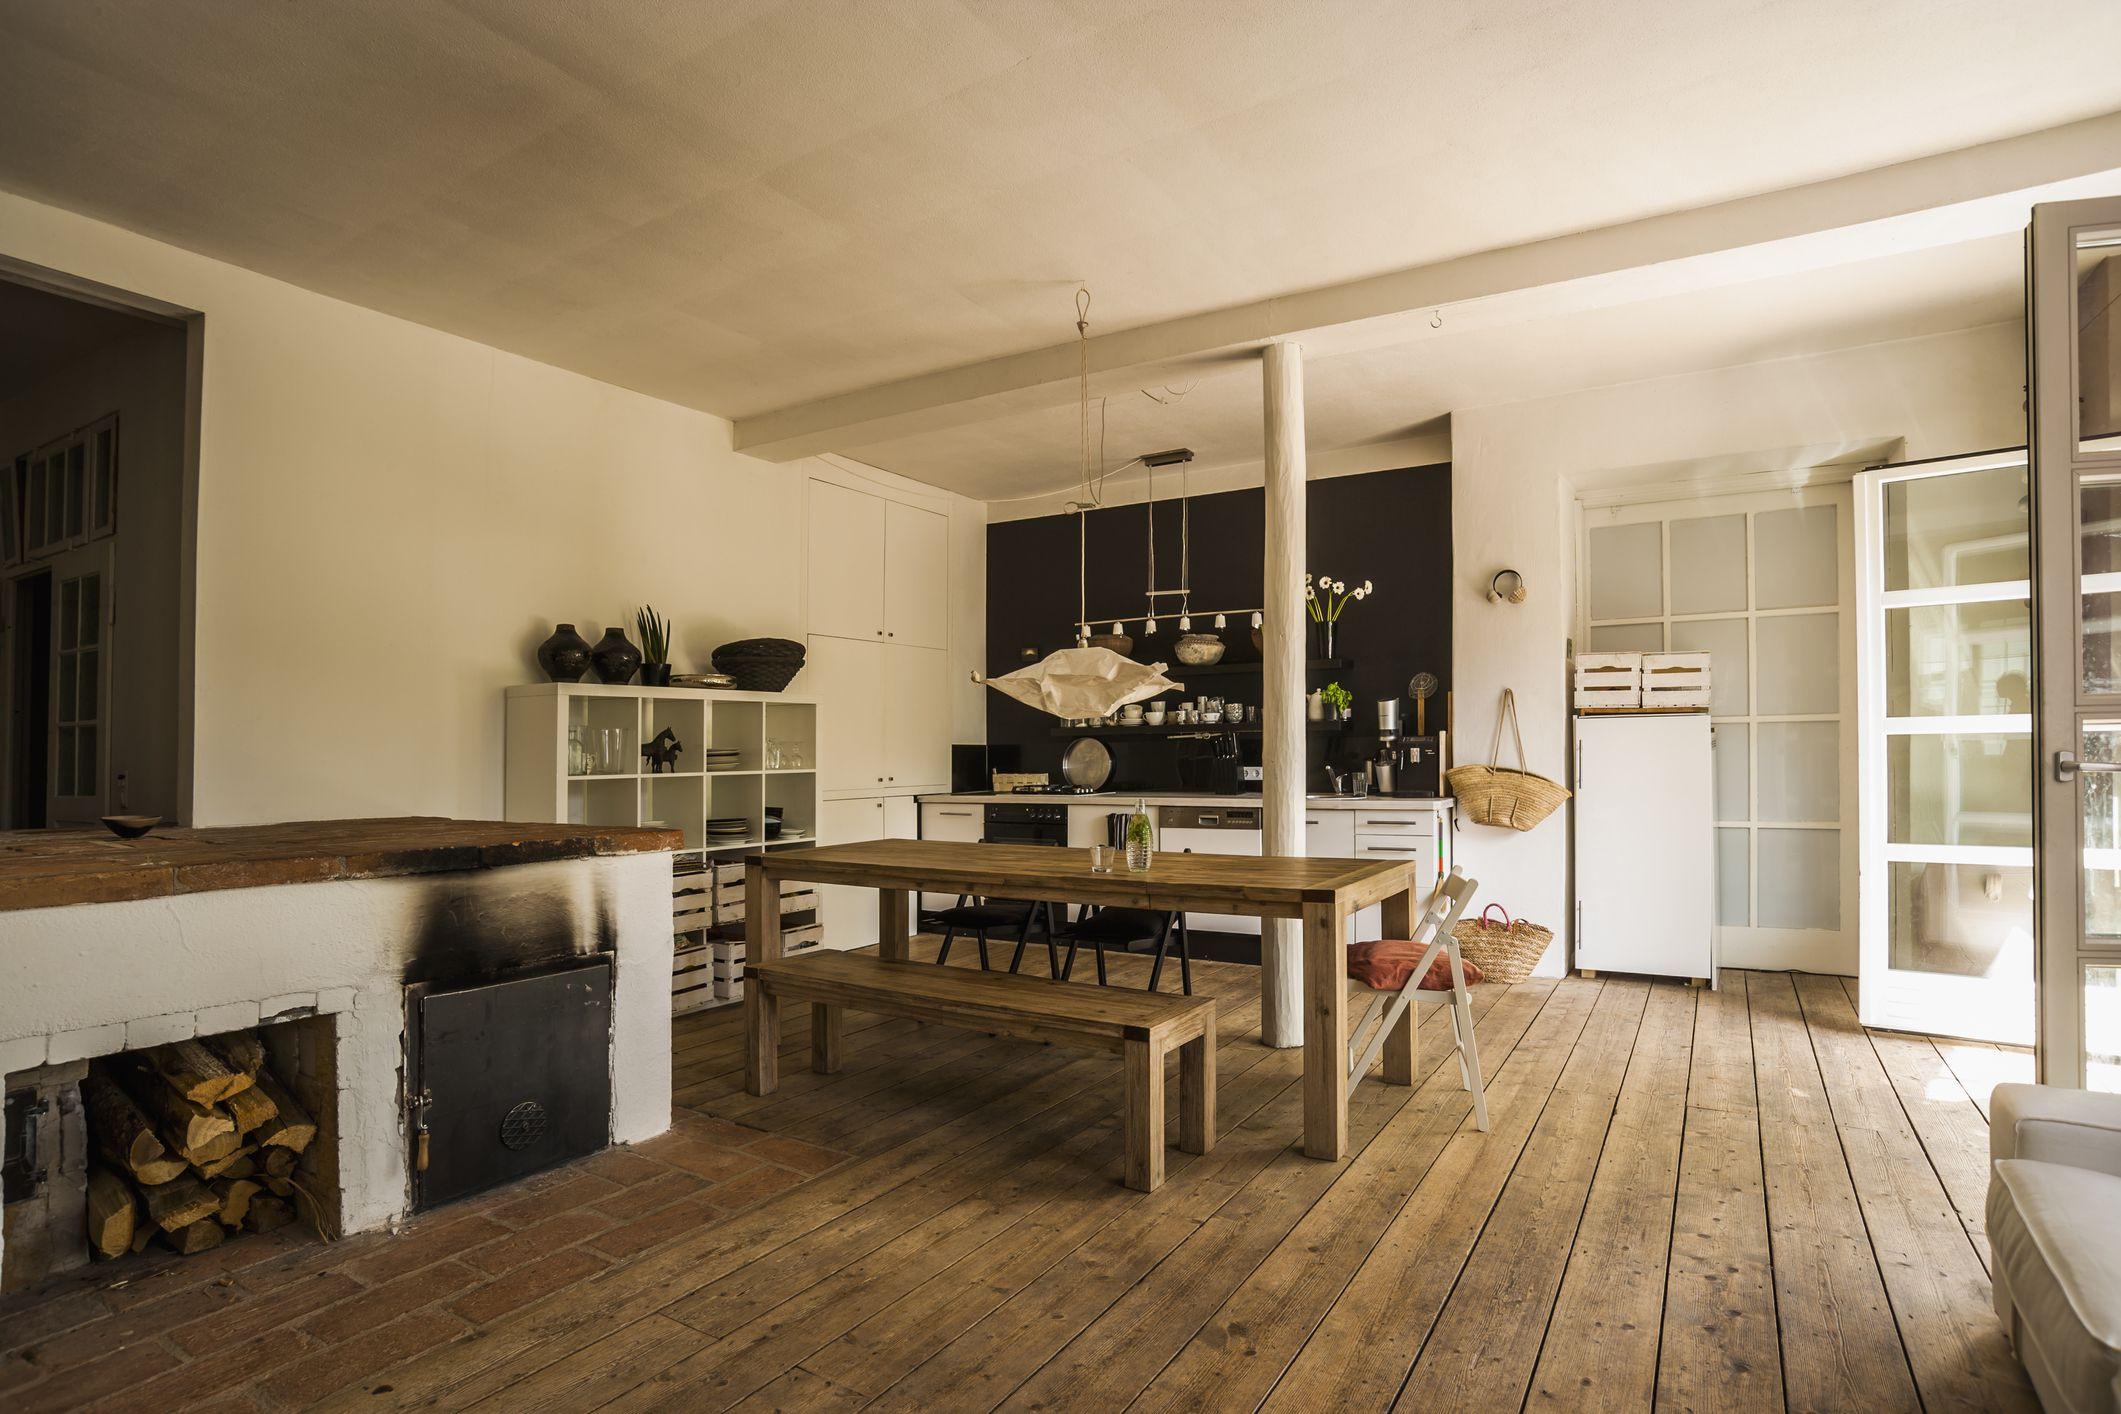 average cost of prefinished hardwood flooring installation of vinyl wood flooring versus natural hardwood within diningroom woodenfloor gettyimages 544546775 590e57565f9b58647043440a